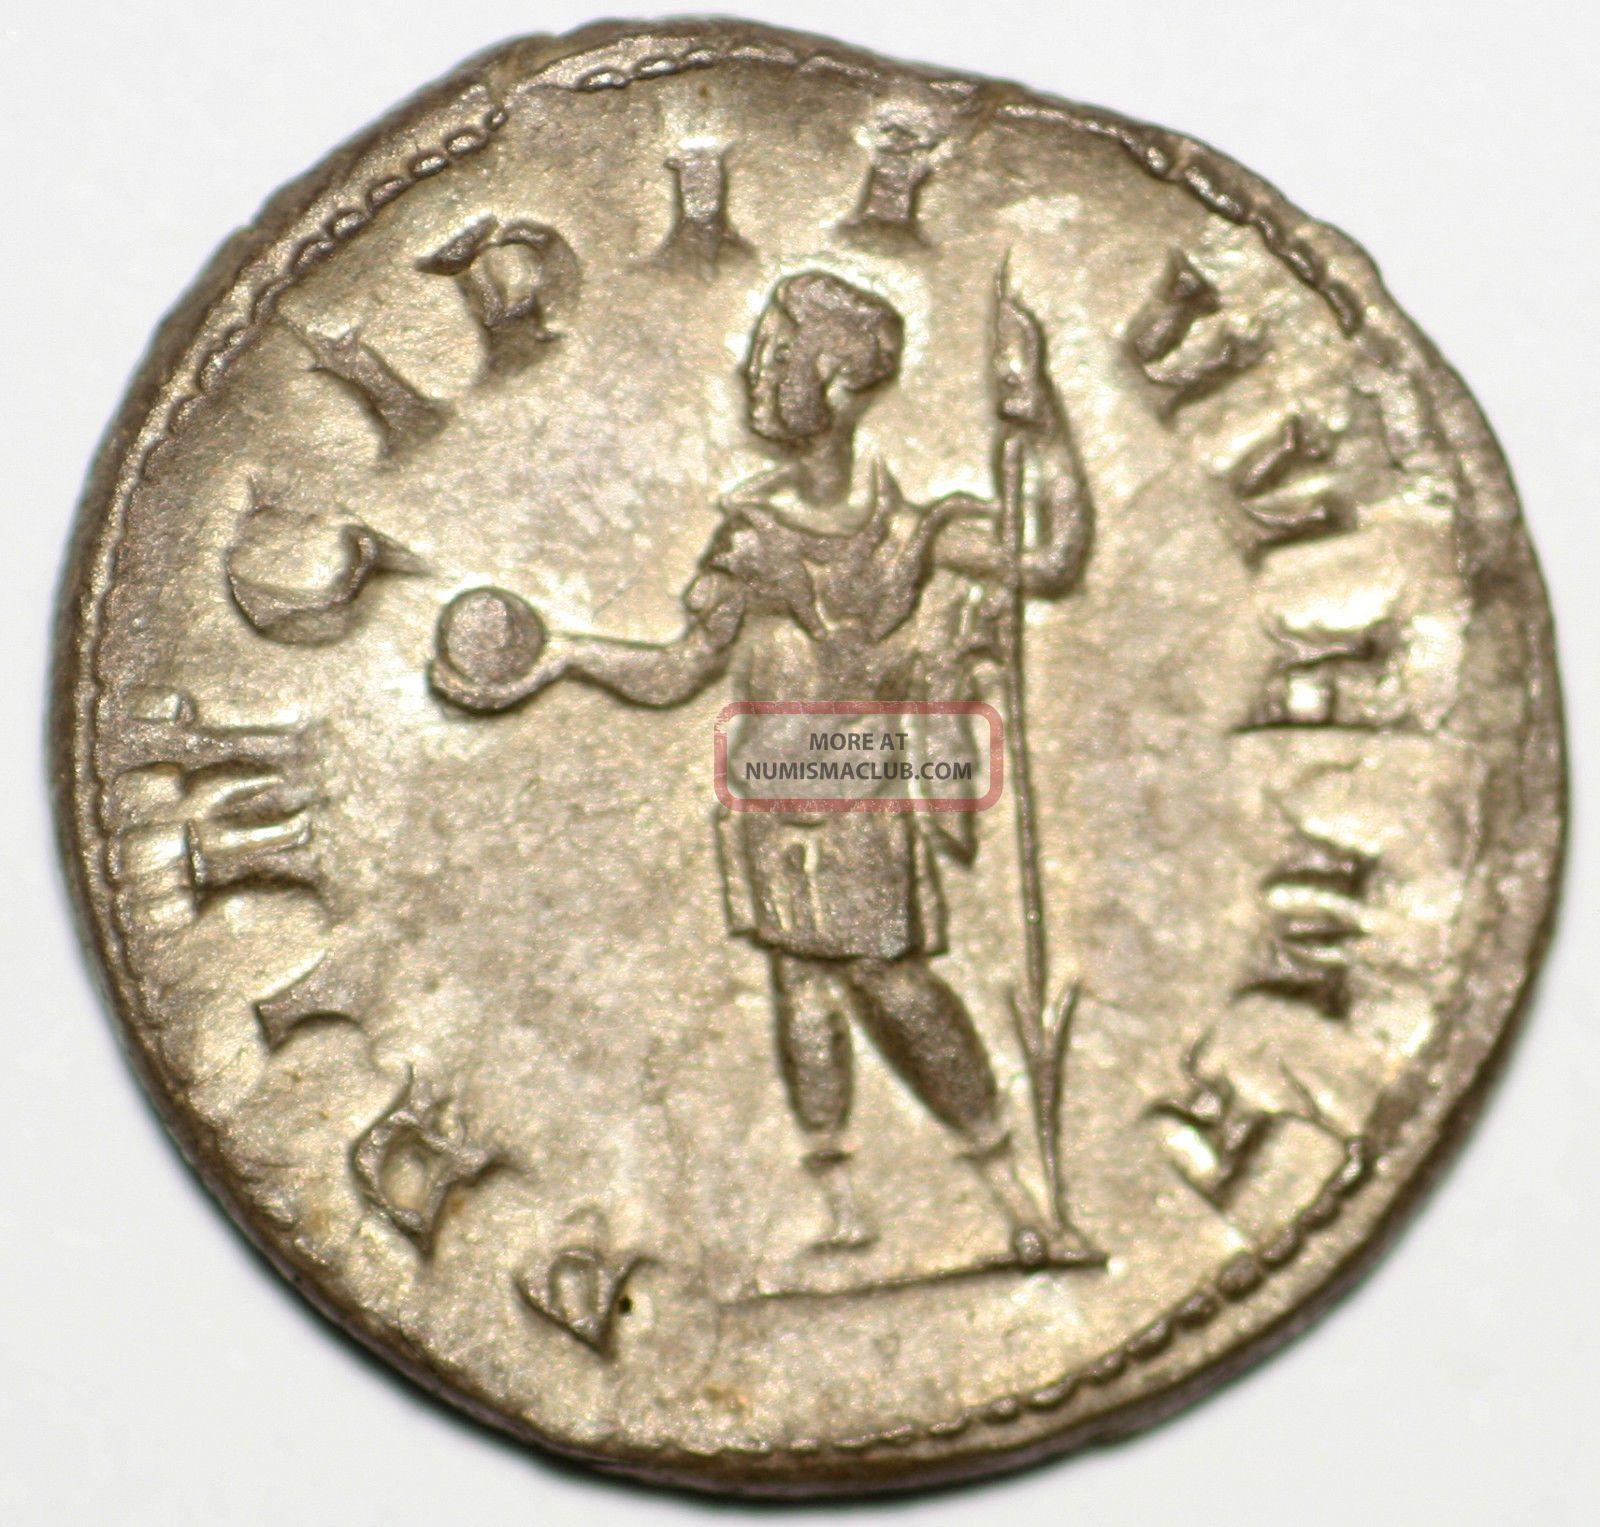 Roman Silver Coin Antoninianus Philip Ii Principi Iuvent 22 M 1,  92 Gr Coins: Ancient photo